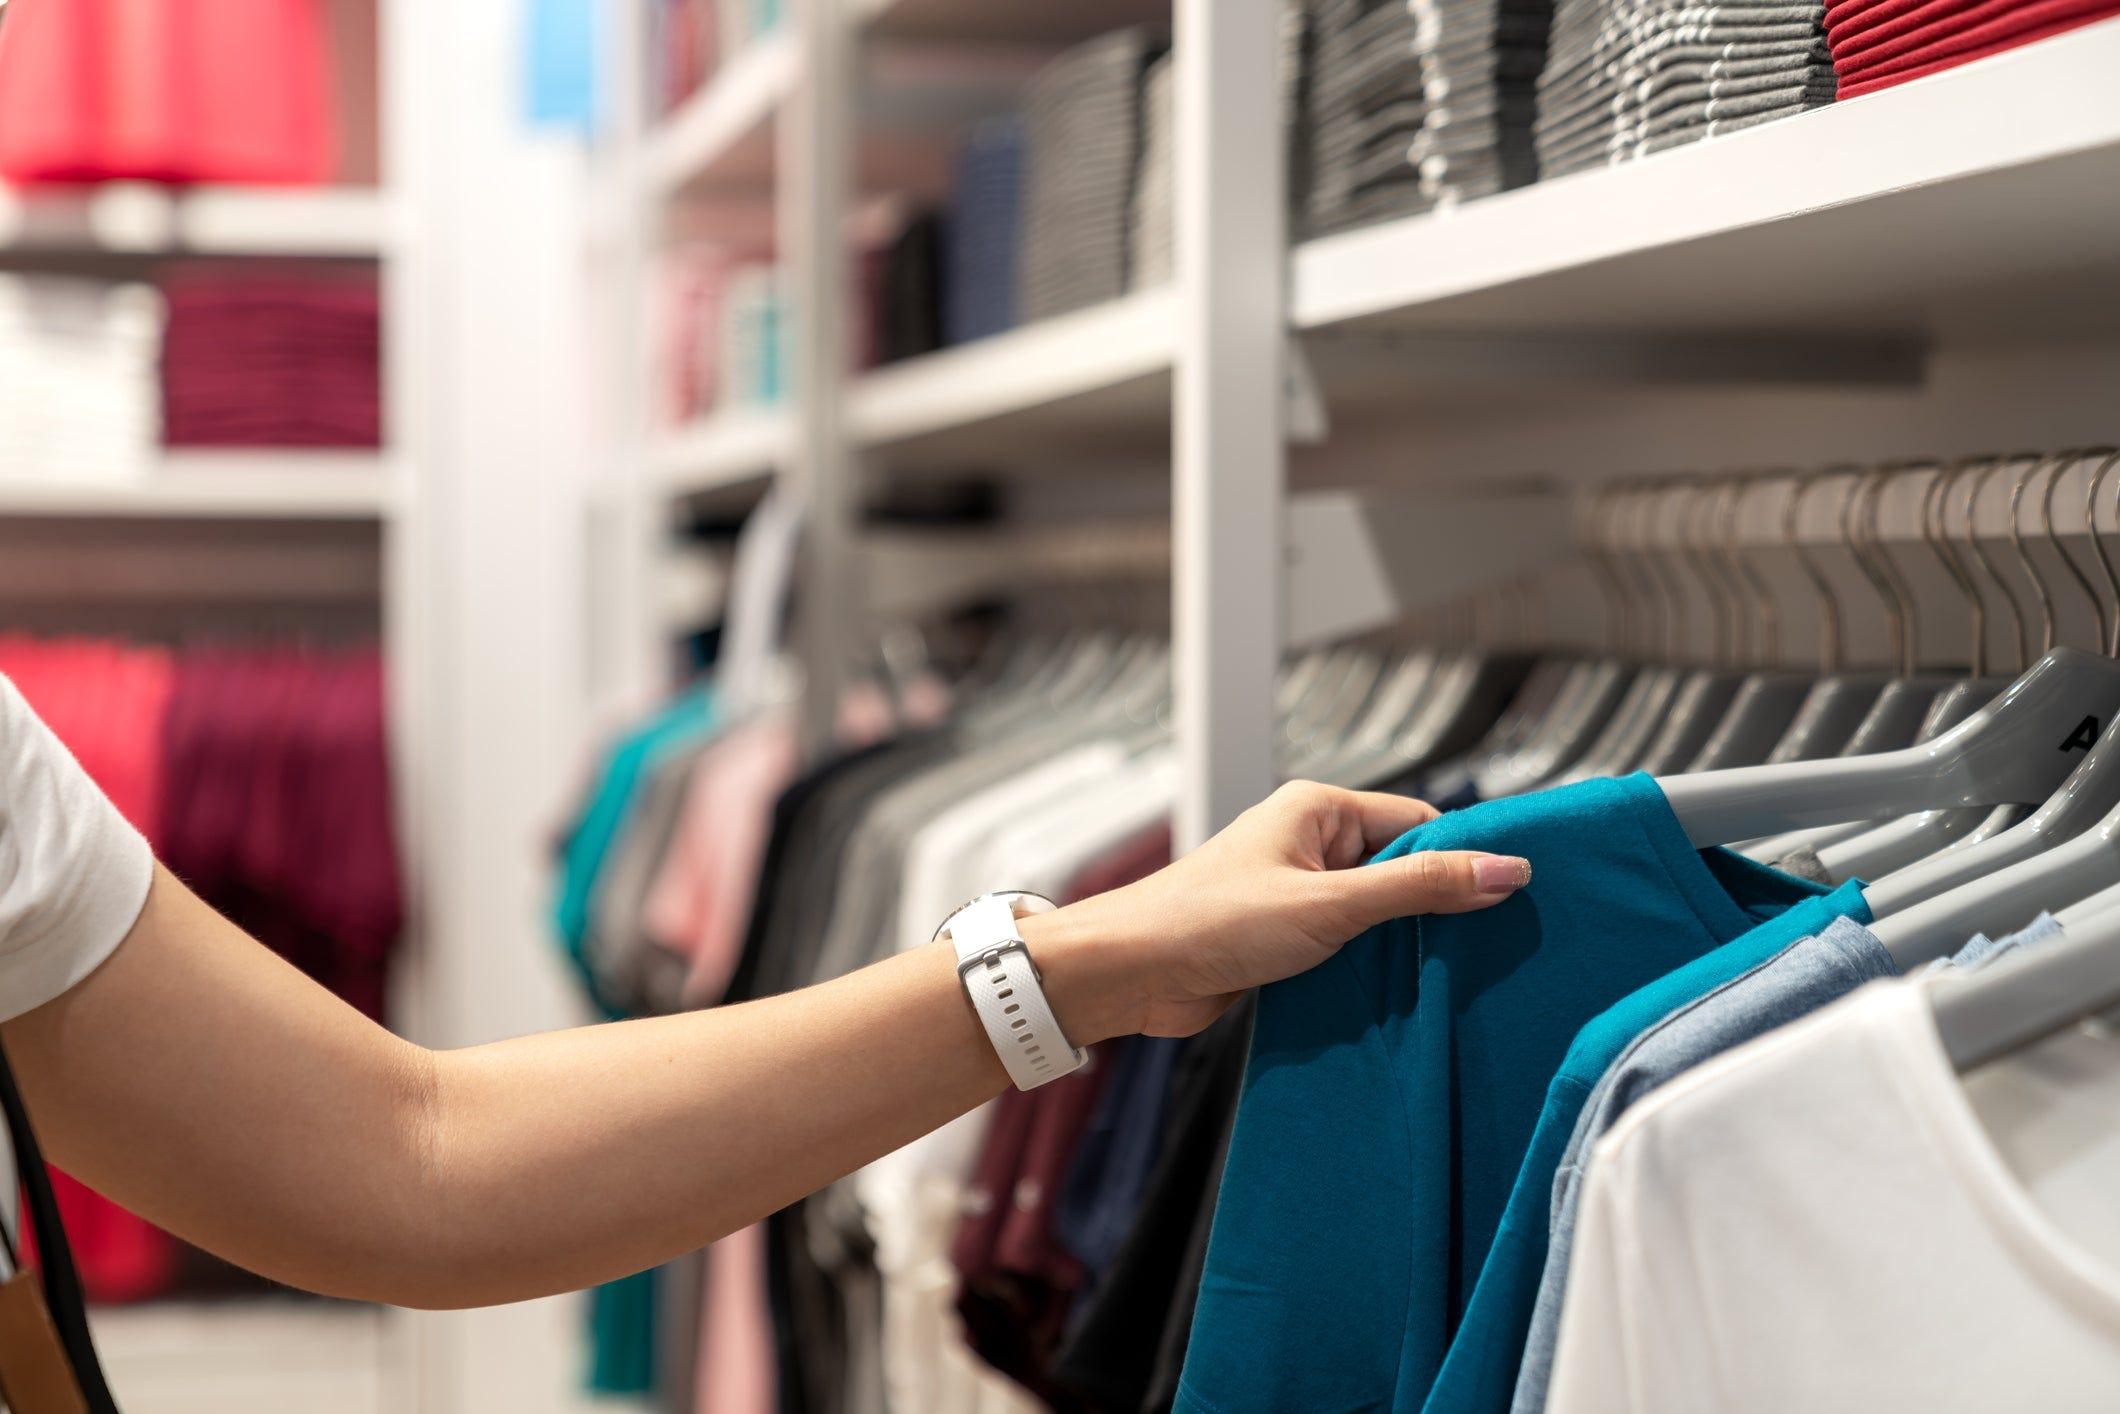 fashion and shopping